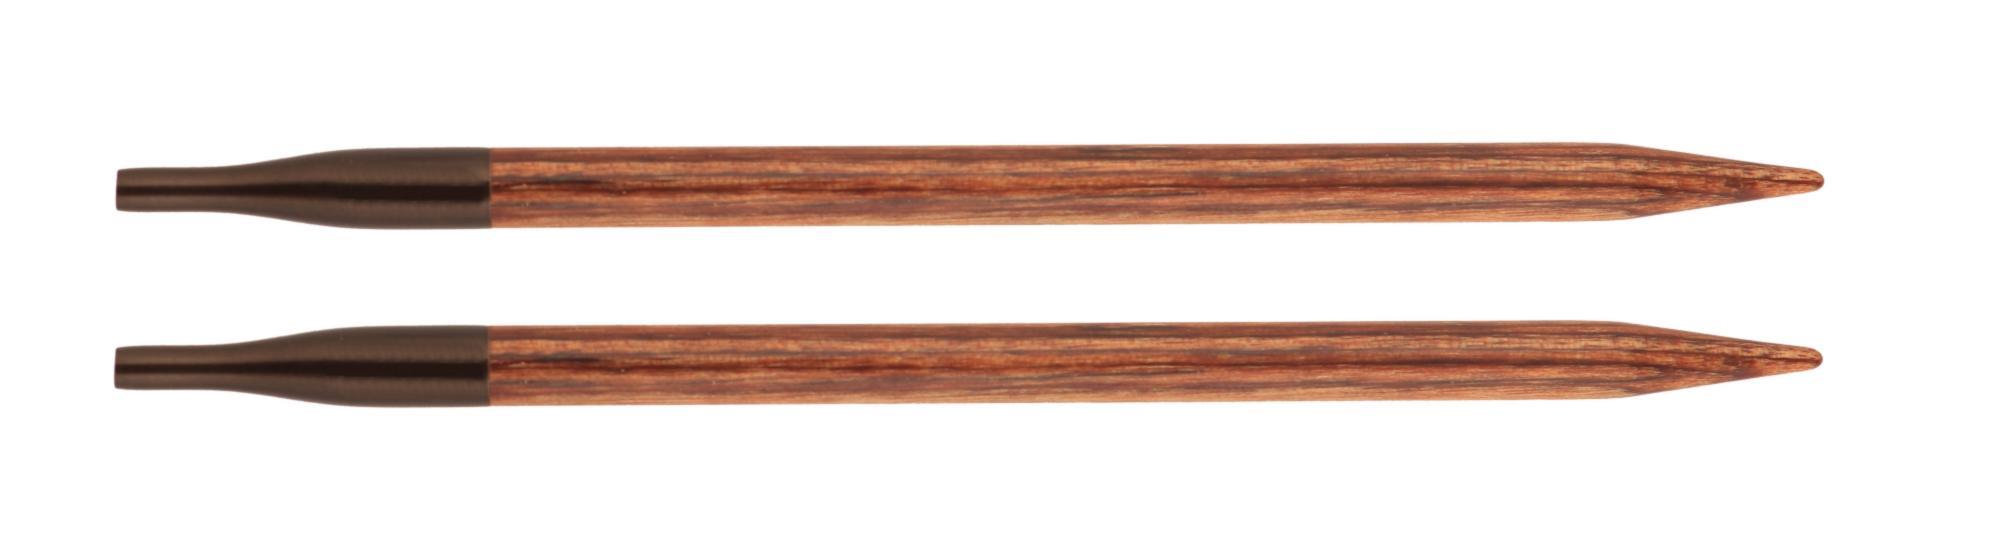 31223 Спицы съемные короткие 3.50 мм Ginger KnitPro